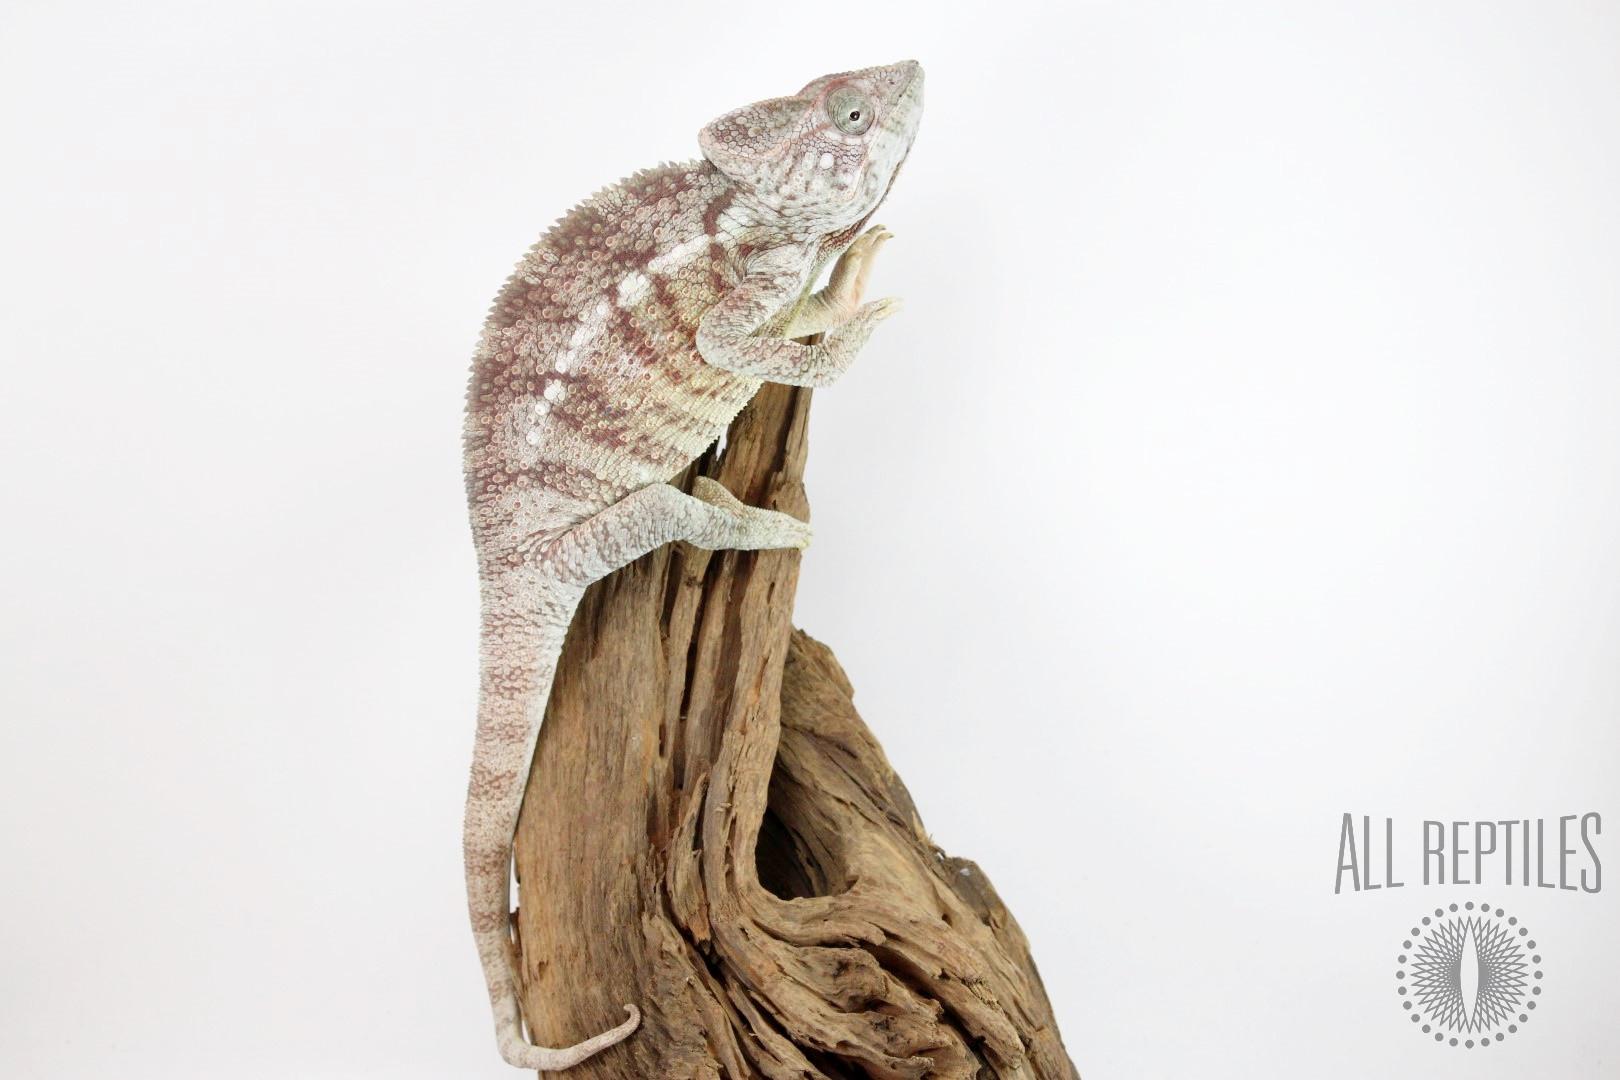 Giant Malagasy Chameleon